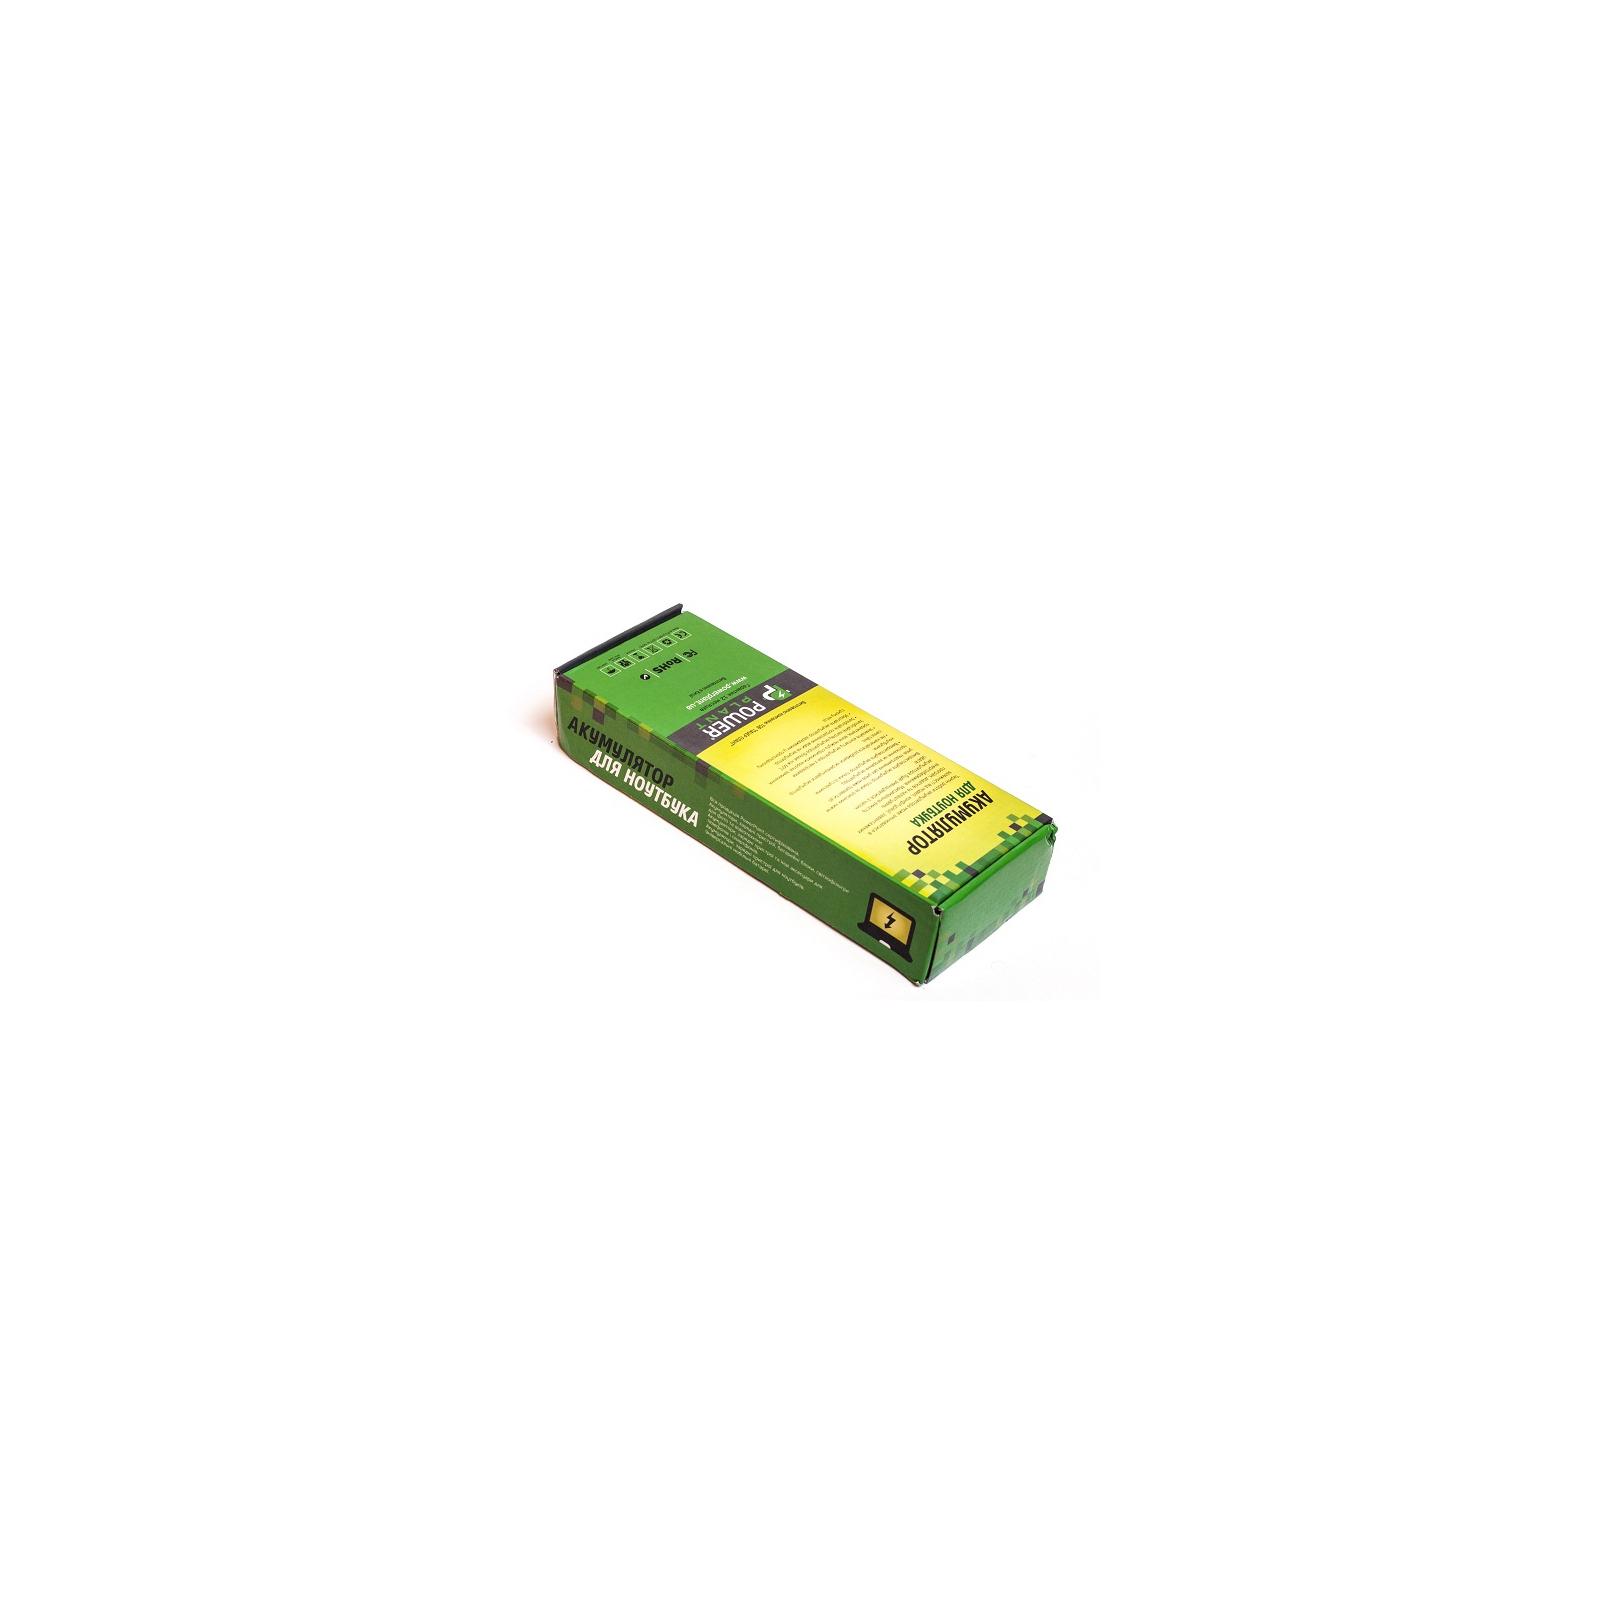 Аккумулятор для ноутбука DELL Inspiron 6400 (KD476, DL6402LH) 11.1V 5200mAh PowerPlant (NB00000110) изображение 2